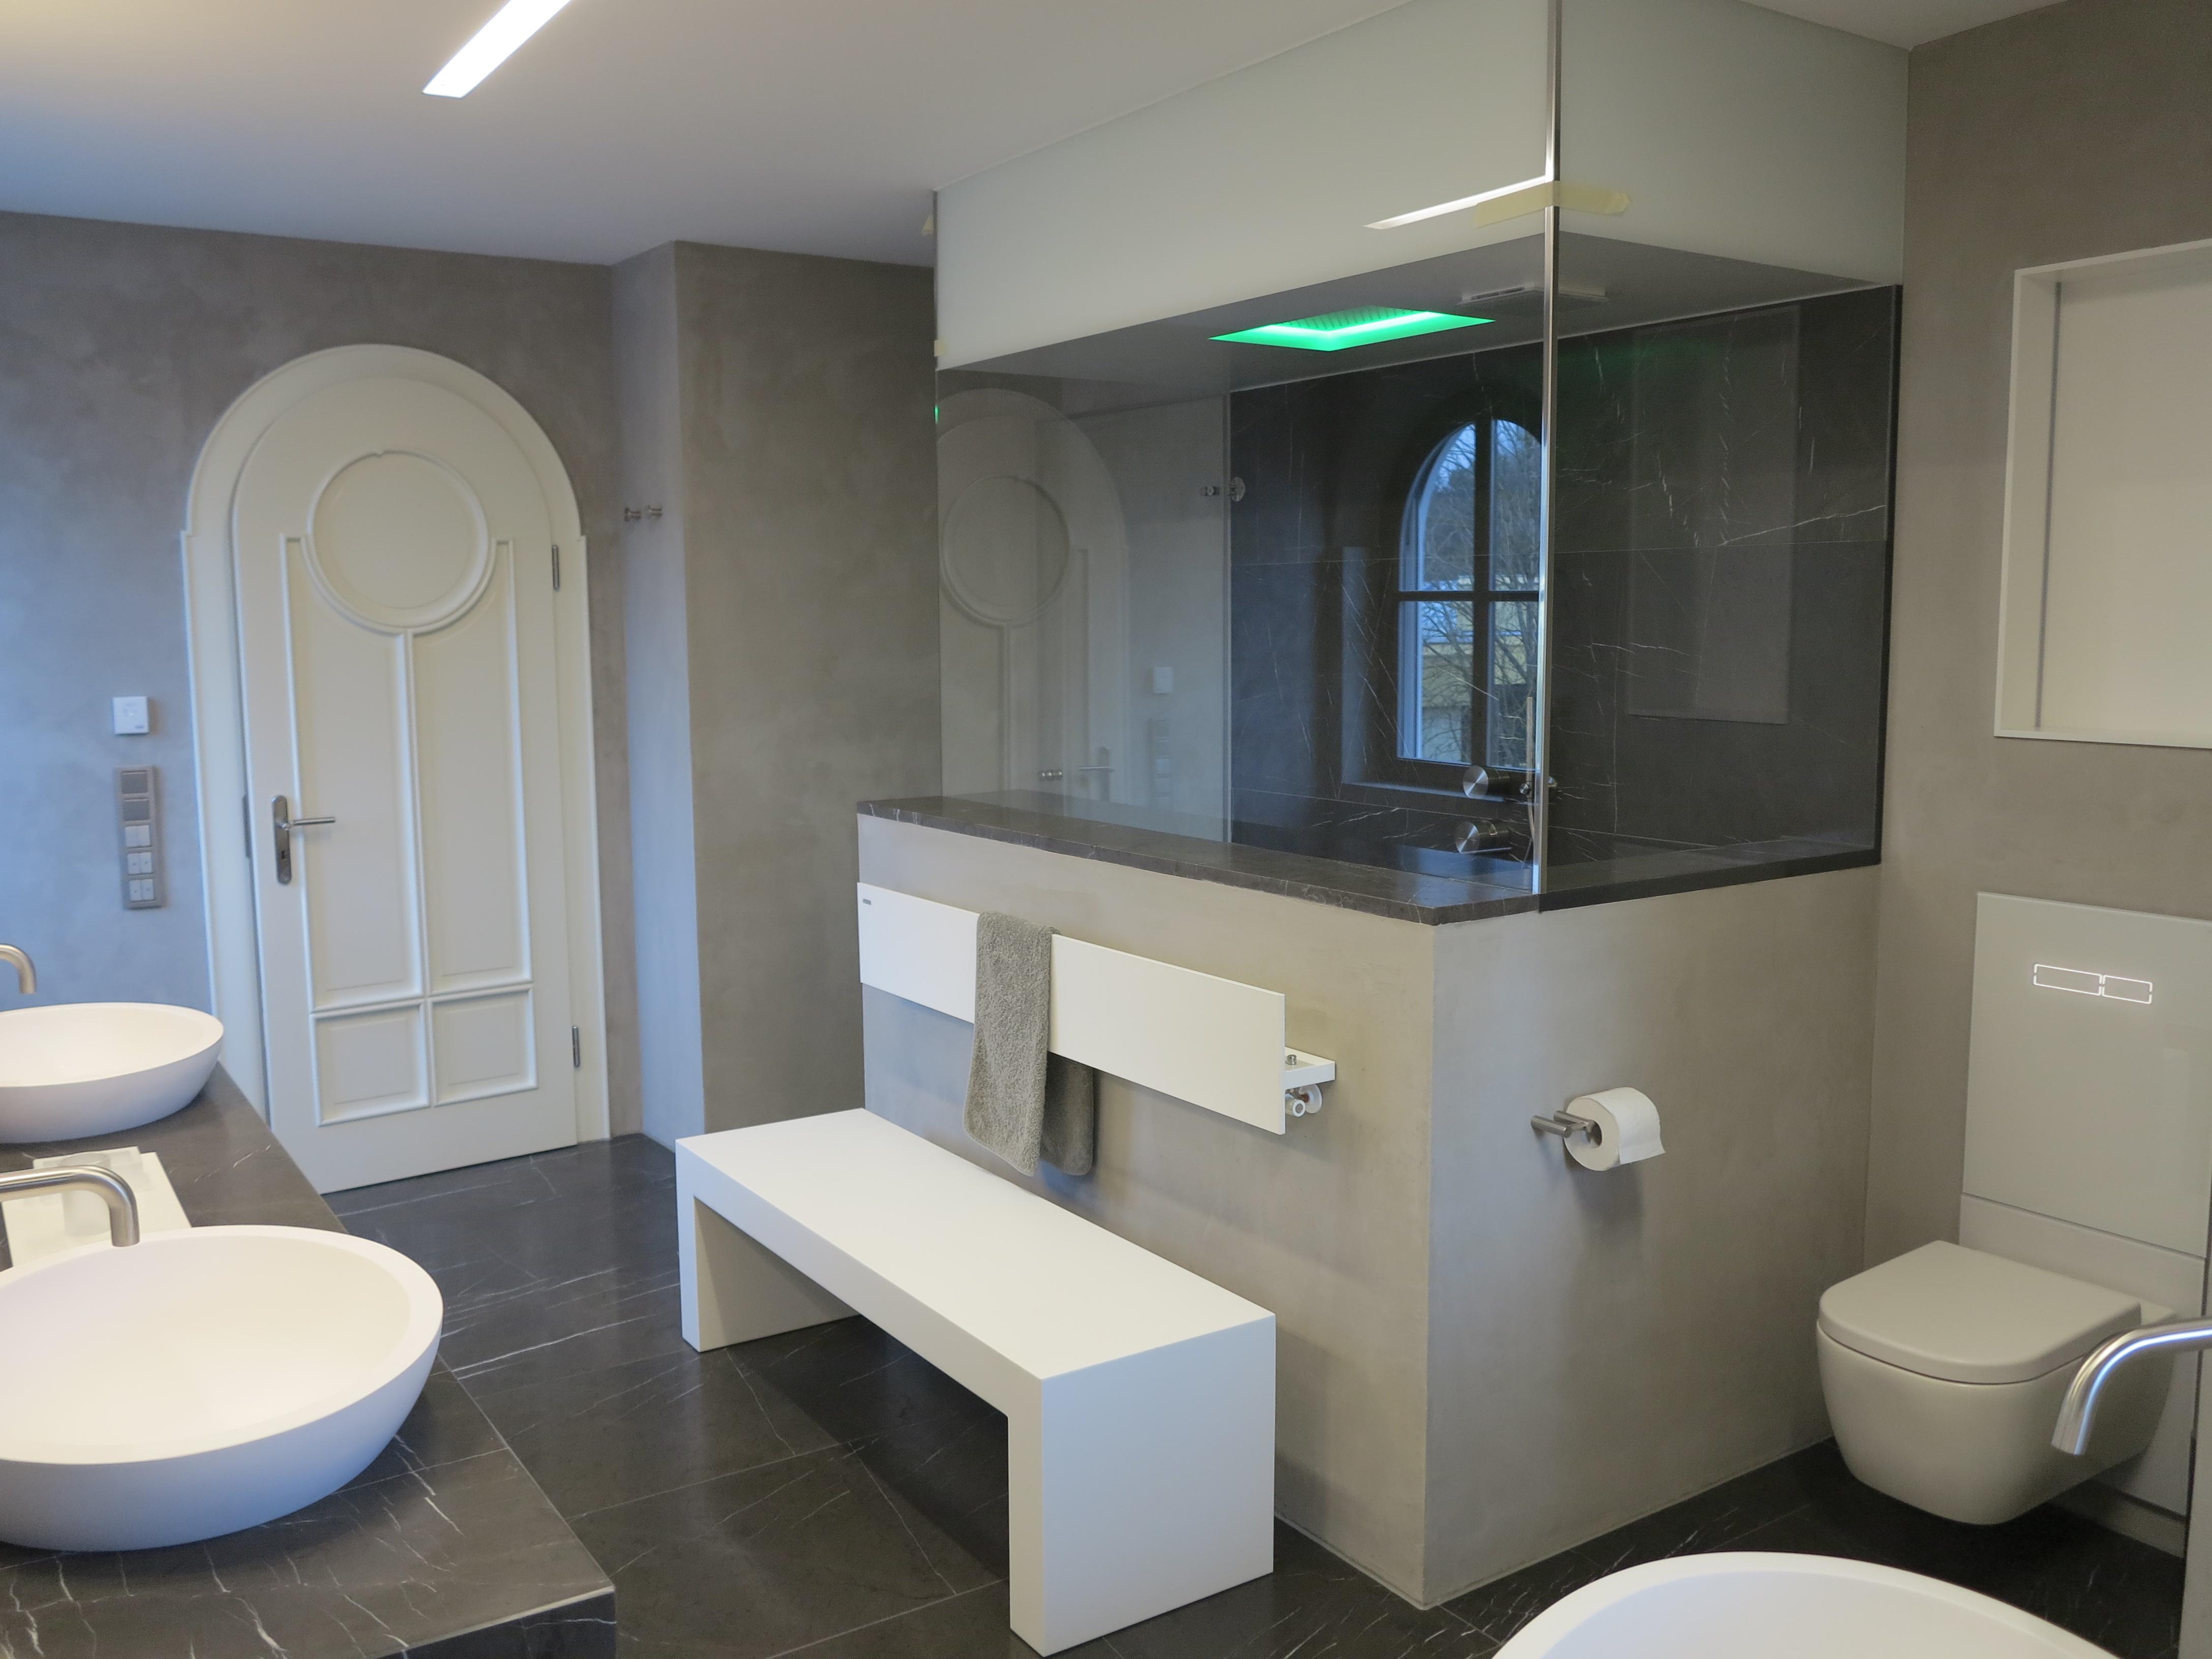 haus garten schwimmbad sauna in bamberg infobel deutschland. Black Bedroom Furniture Sets. Home Design Ideas